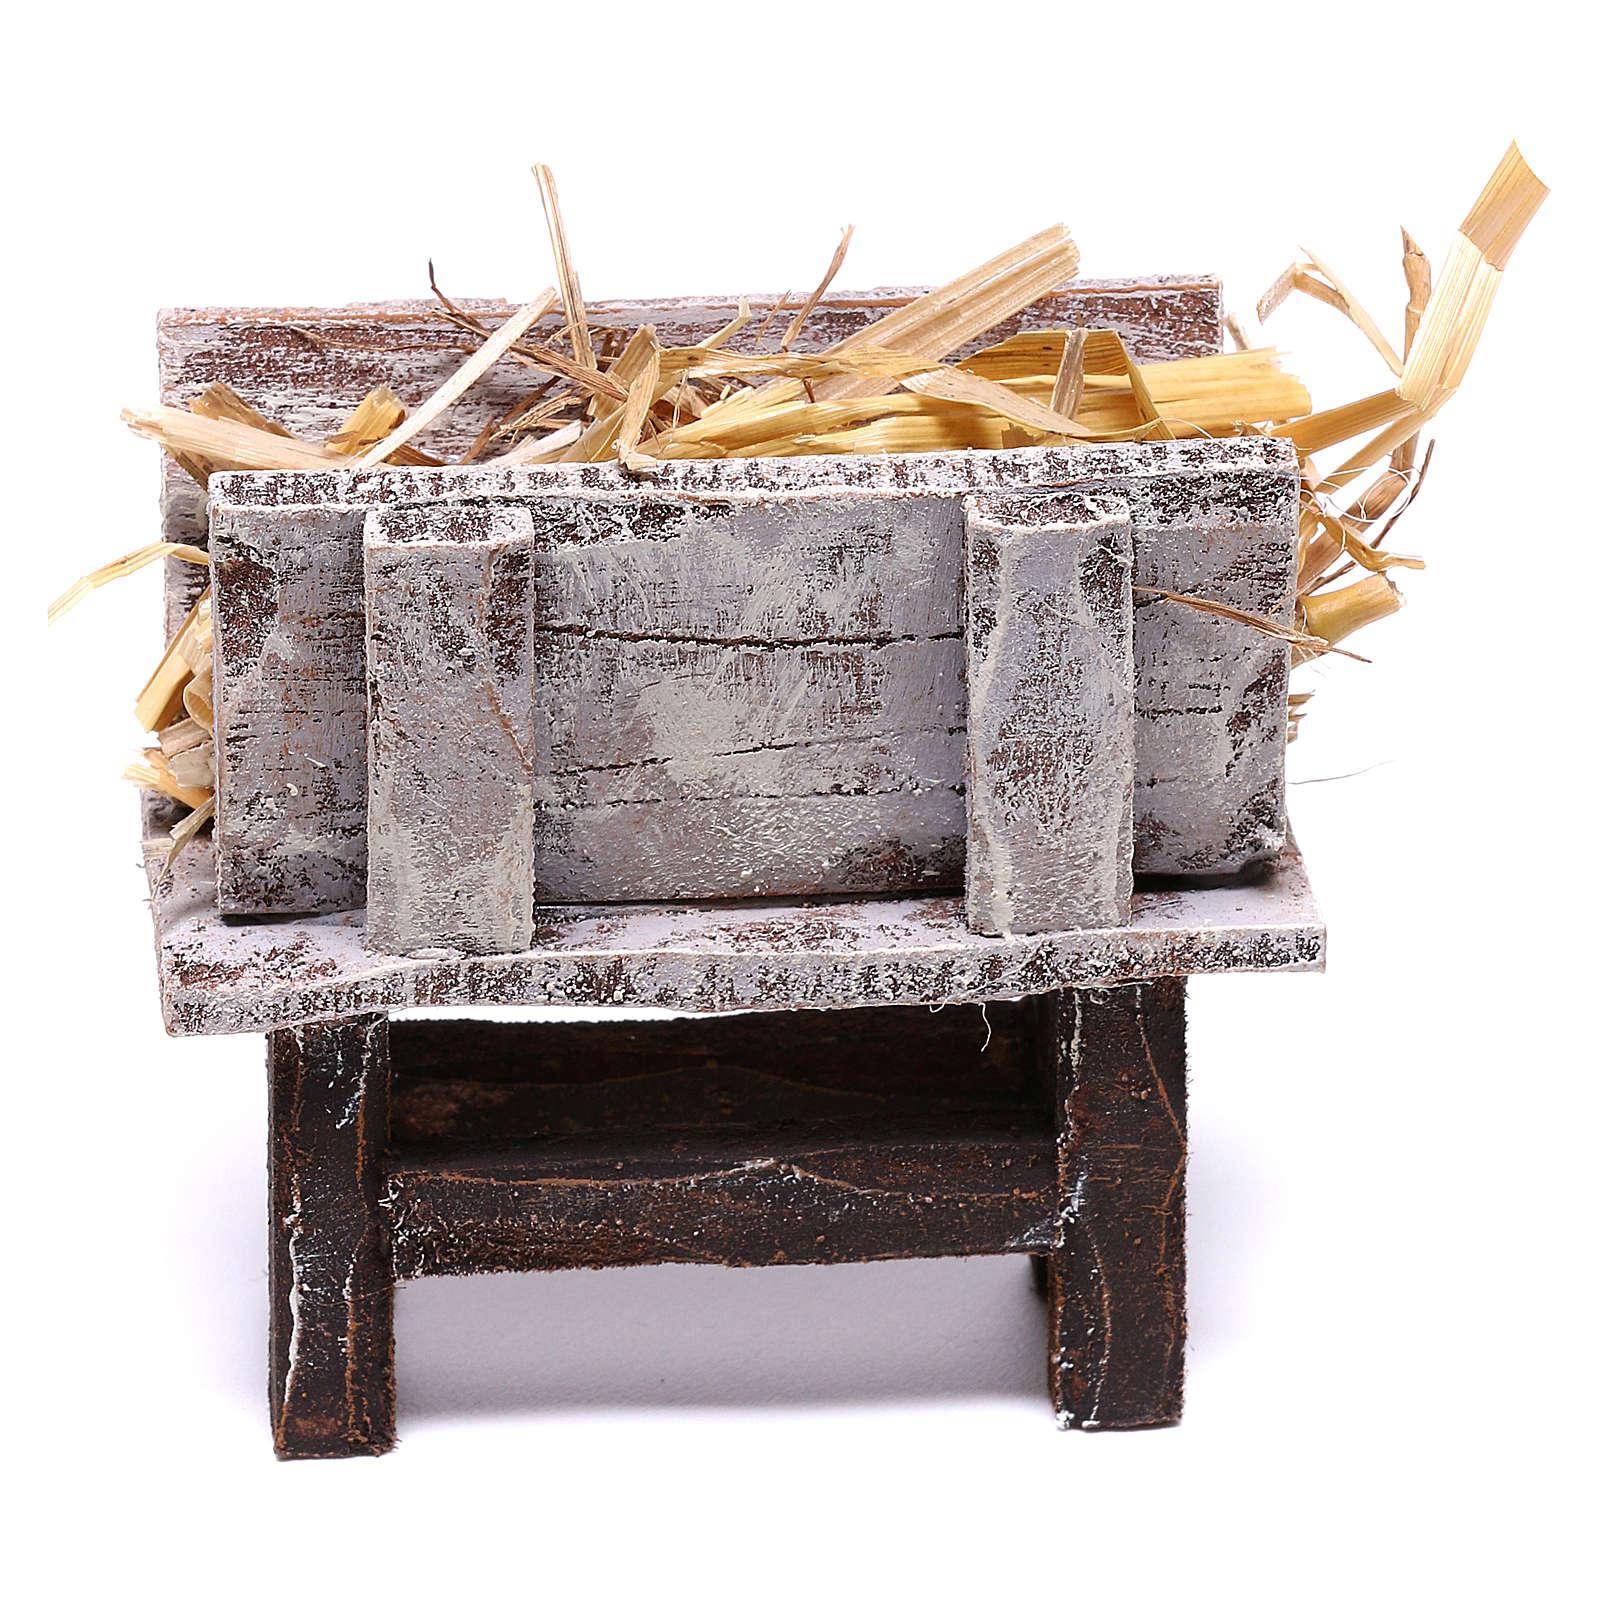 Feeder 6x6.5x3 cm for Nativity scene 10 cm 4